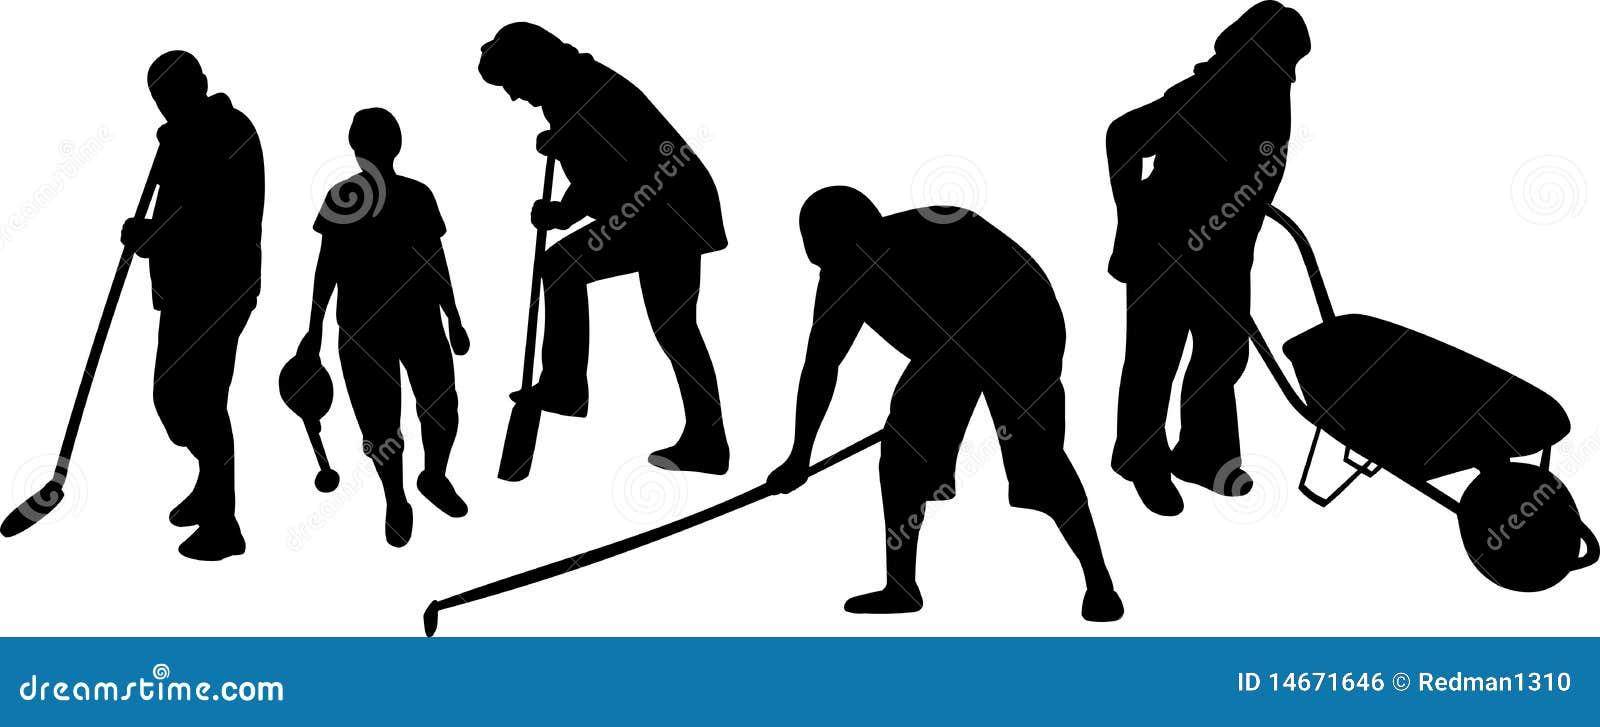 Working people royalty free stock image image 14671646